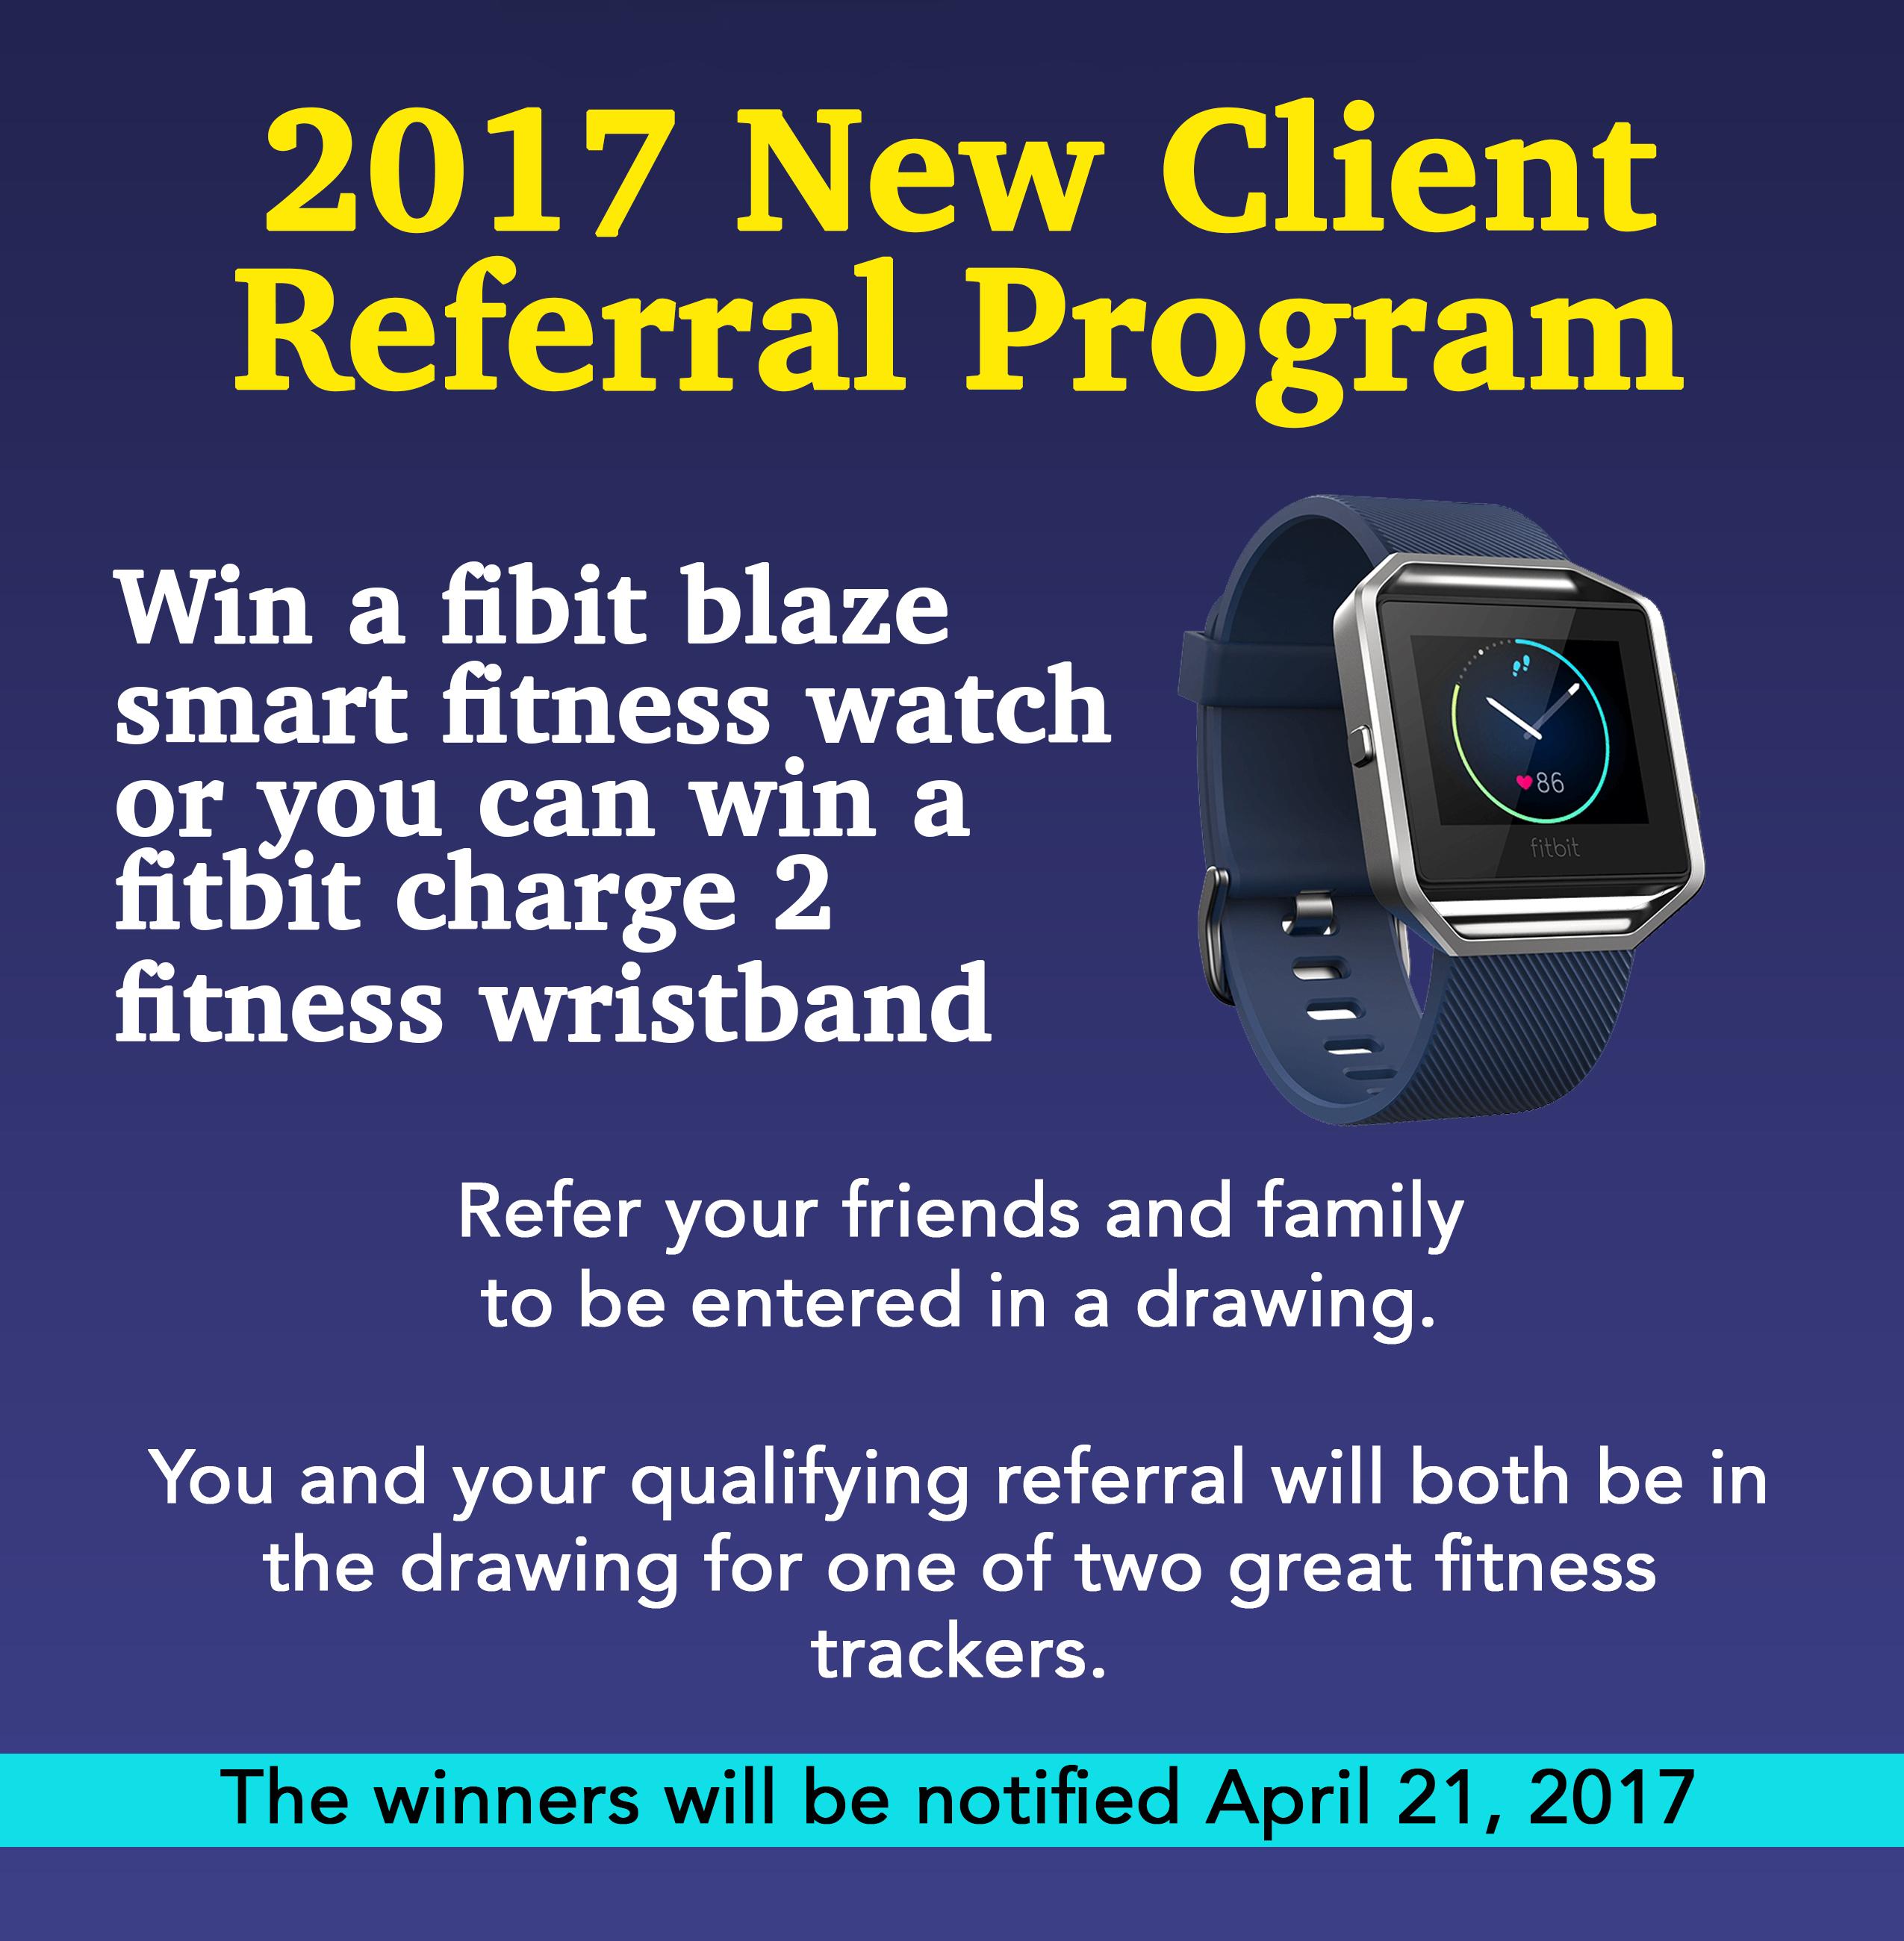 2017 referral program as offered by john and john accounting in idaho falls, idaho